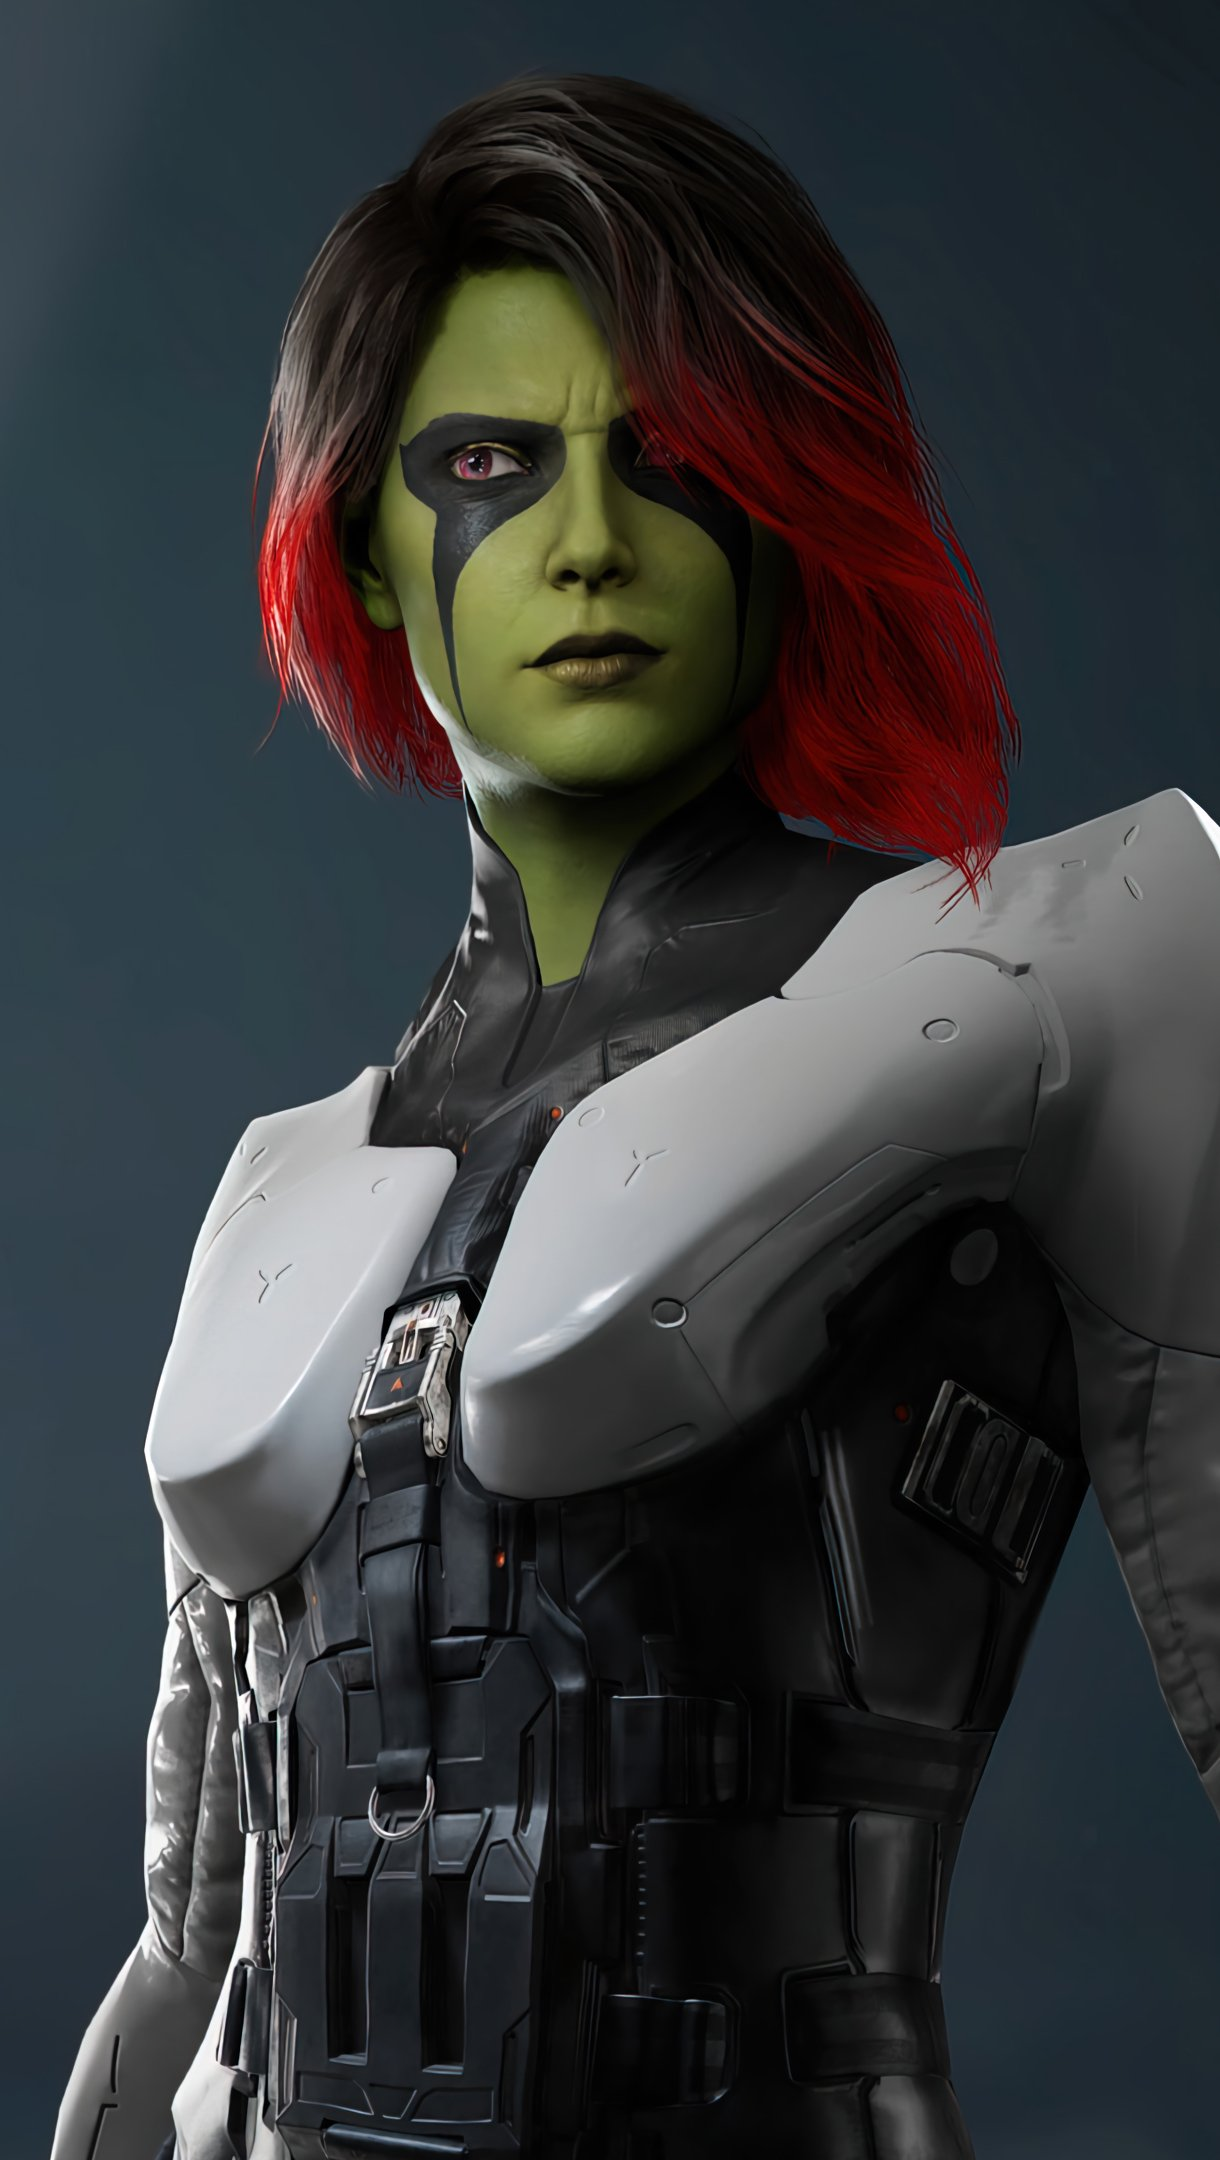 Fondos de pantalla Gamora Marvels Guardianes de la galaxia Vertical